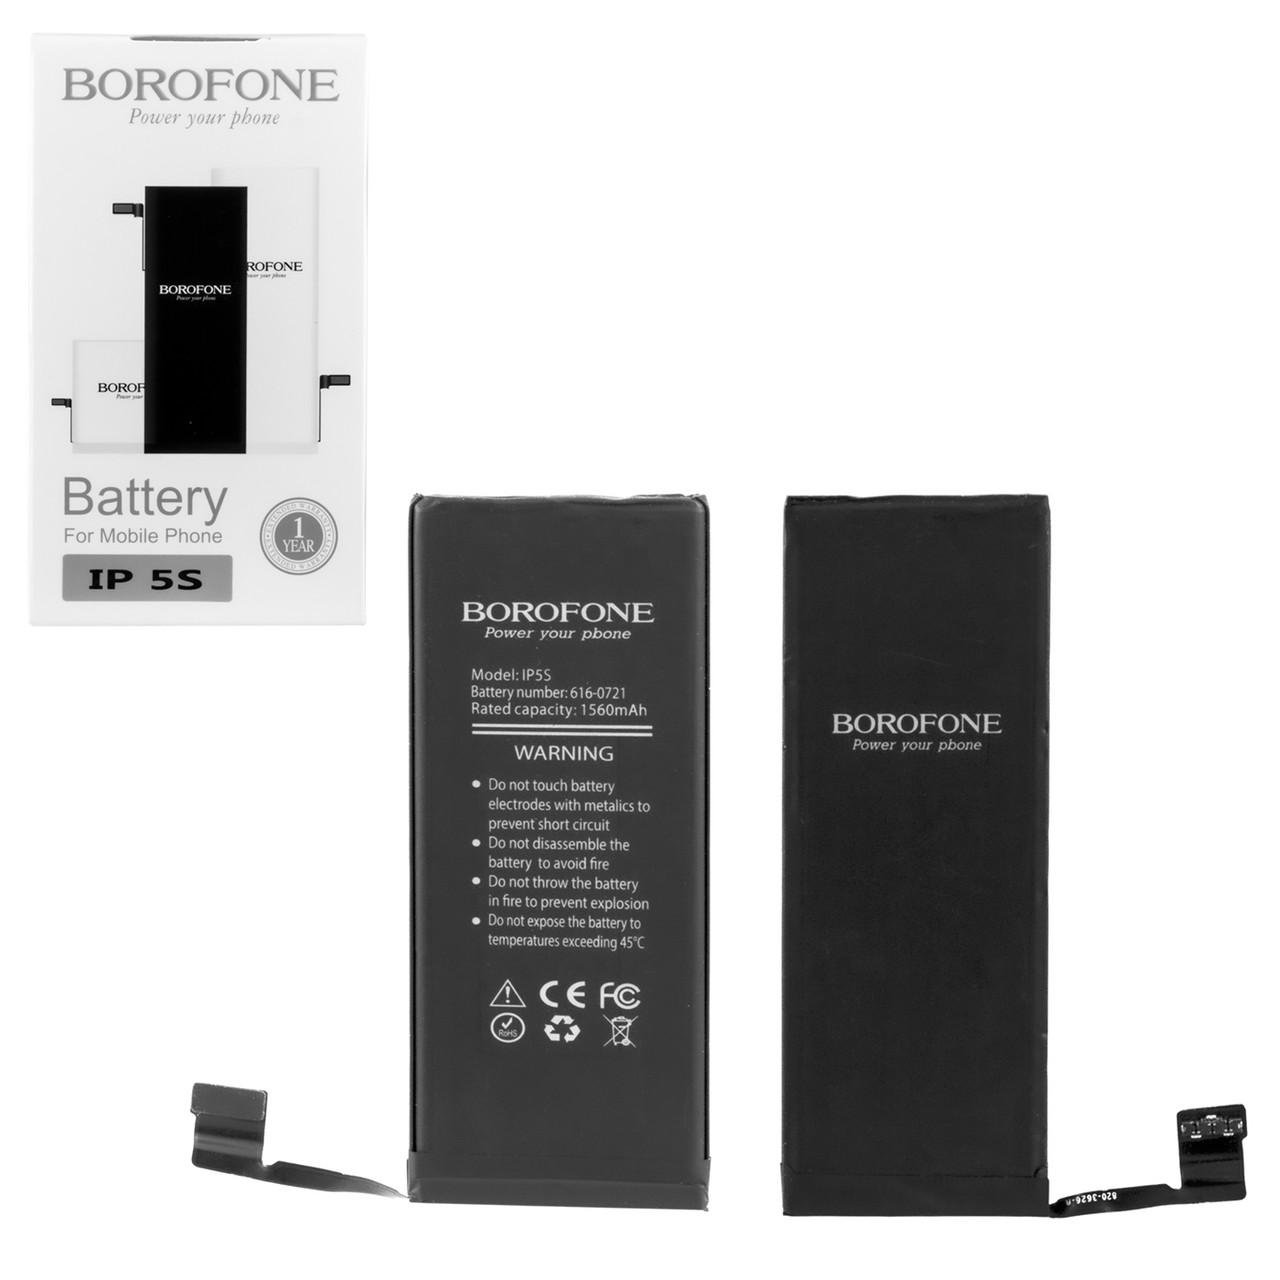 Аккумулятор Apple iPhone 5S 1560mAh Borofone